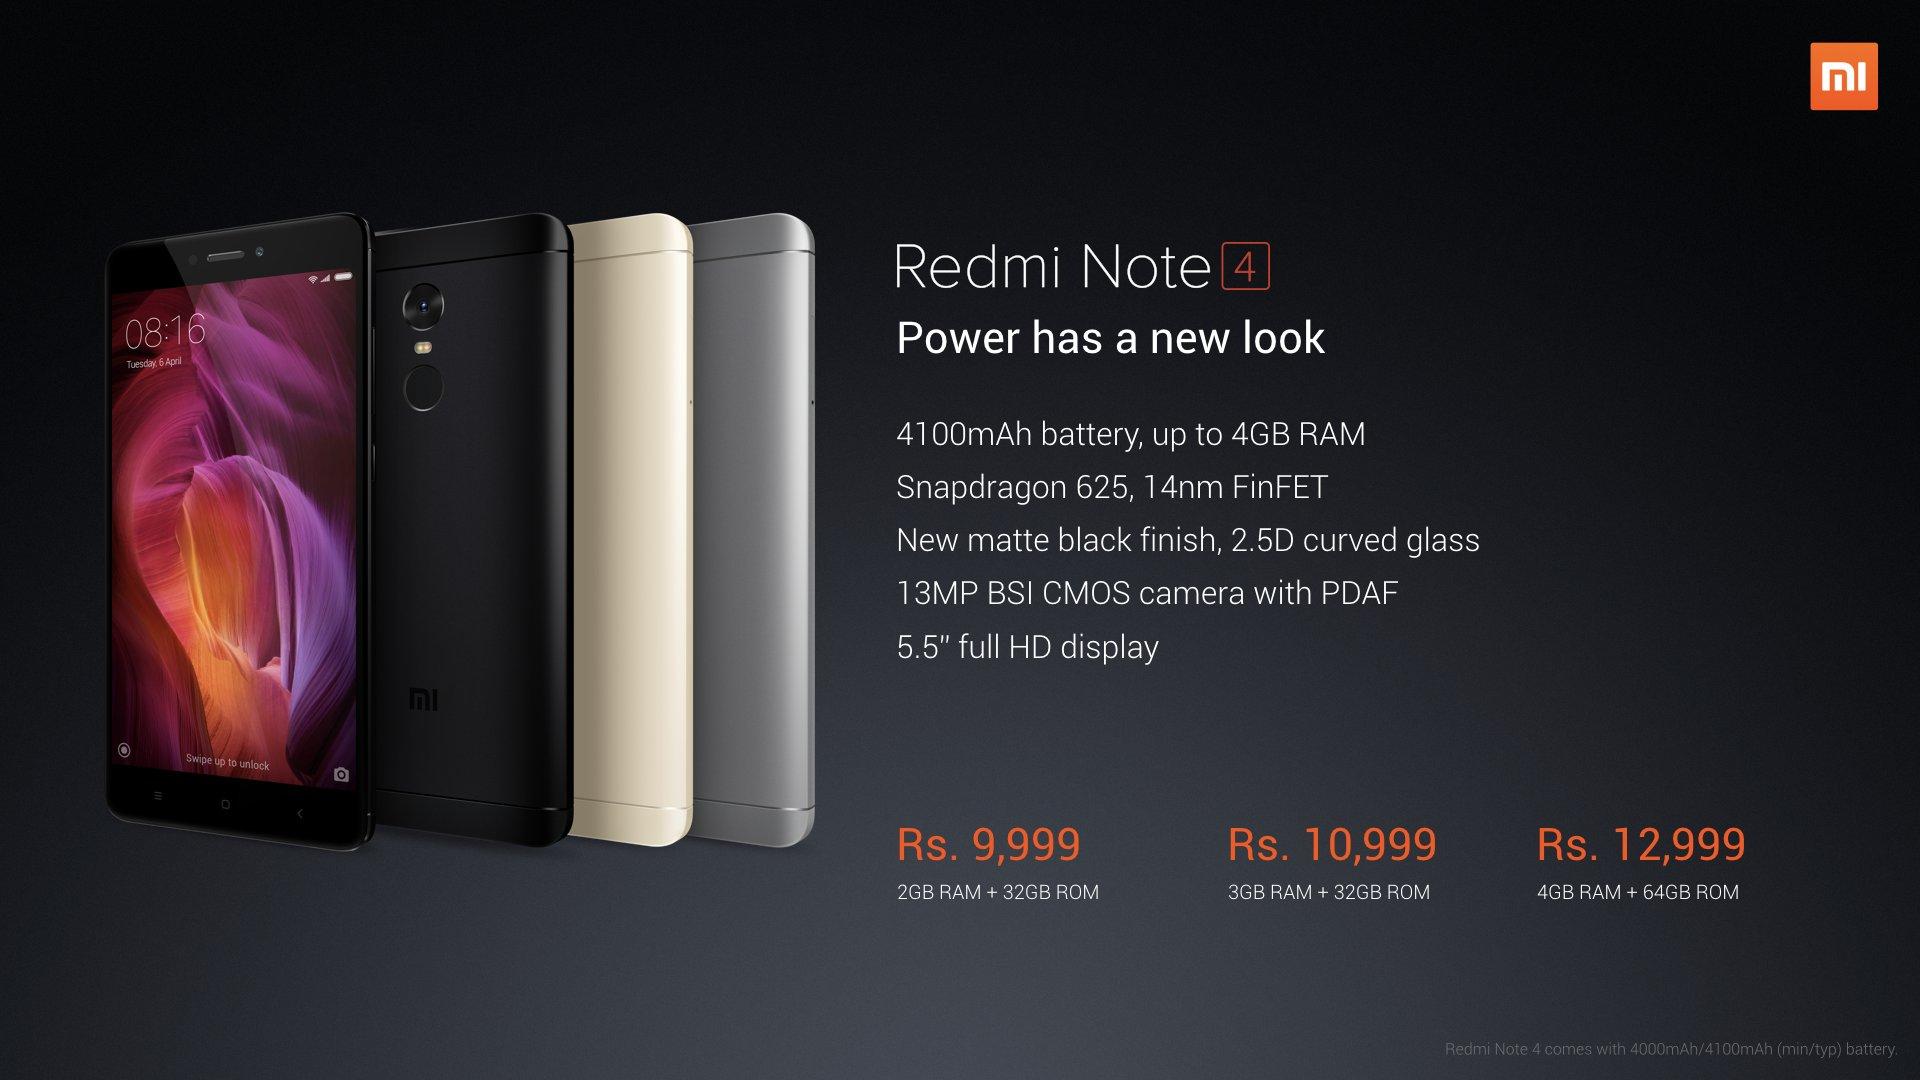 Xiaomi Redmi Note 4 Tips And Tricks: Tricks To Buy Xiaomi Redmi Note 4 Flipkart Exclusive